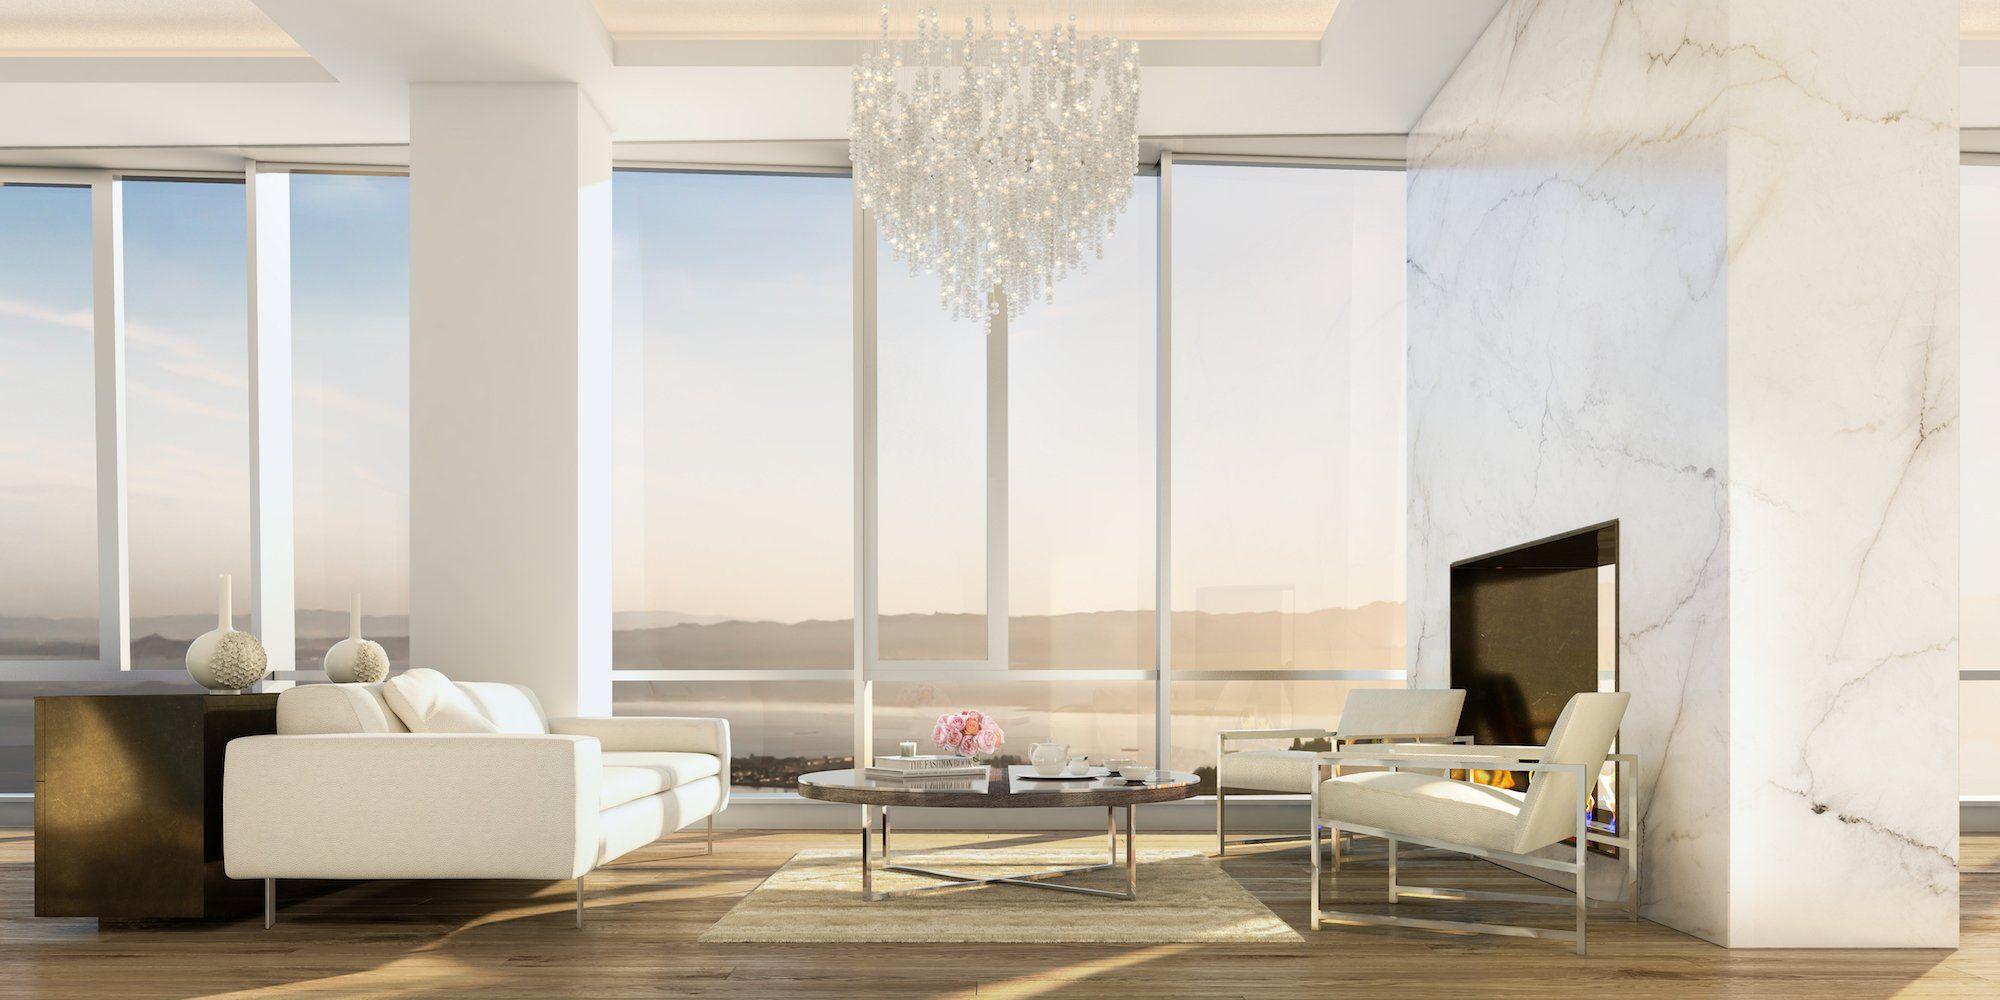 Photos of San Francisco's tallest penthouse apartment ...